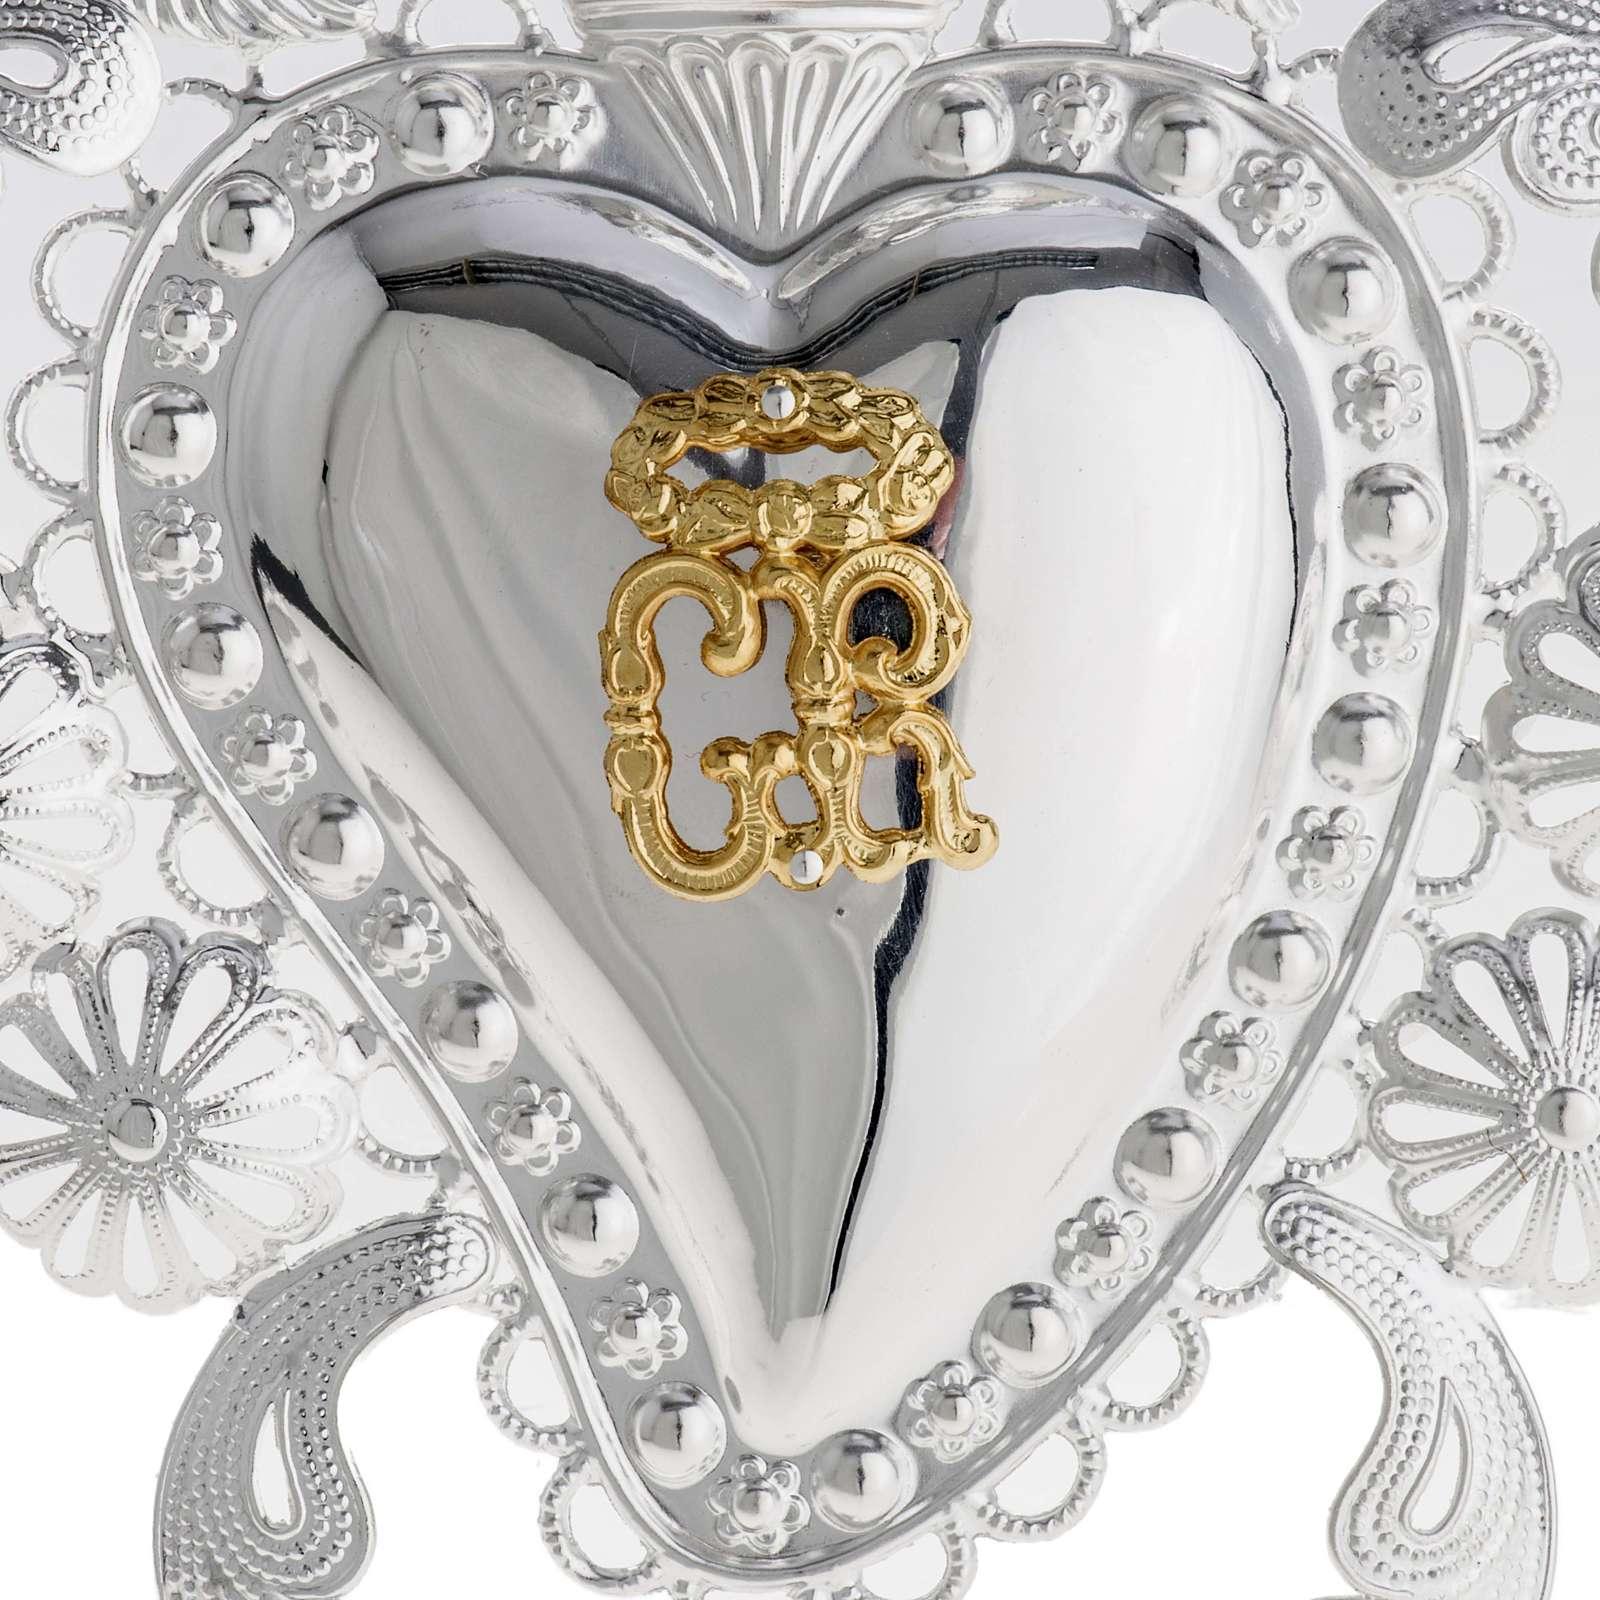 Corazón votivo filigrana 14 x 20 cm. 3